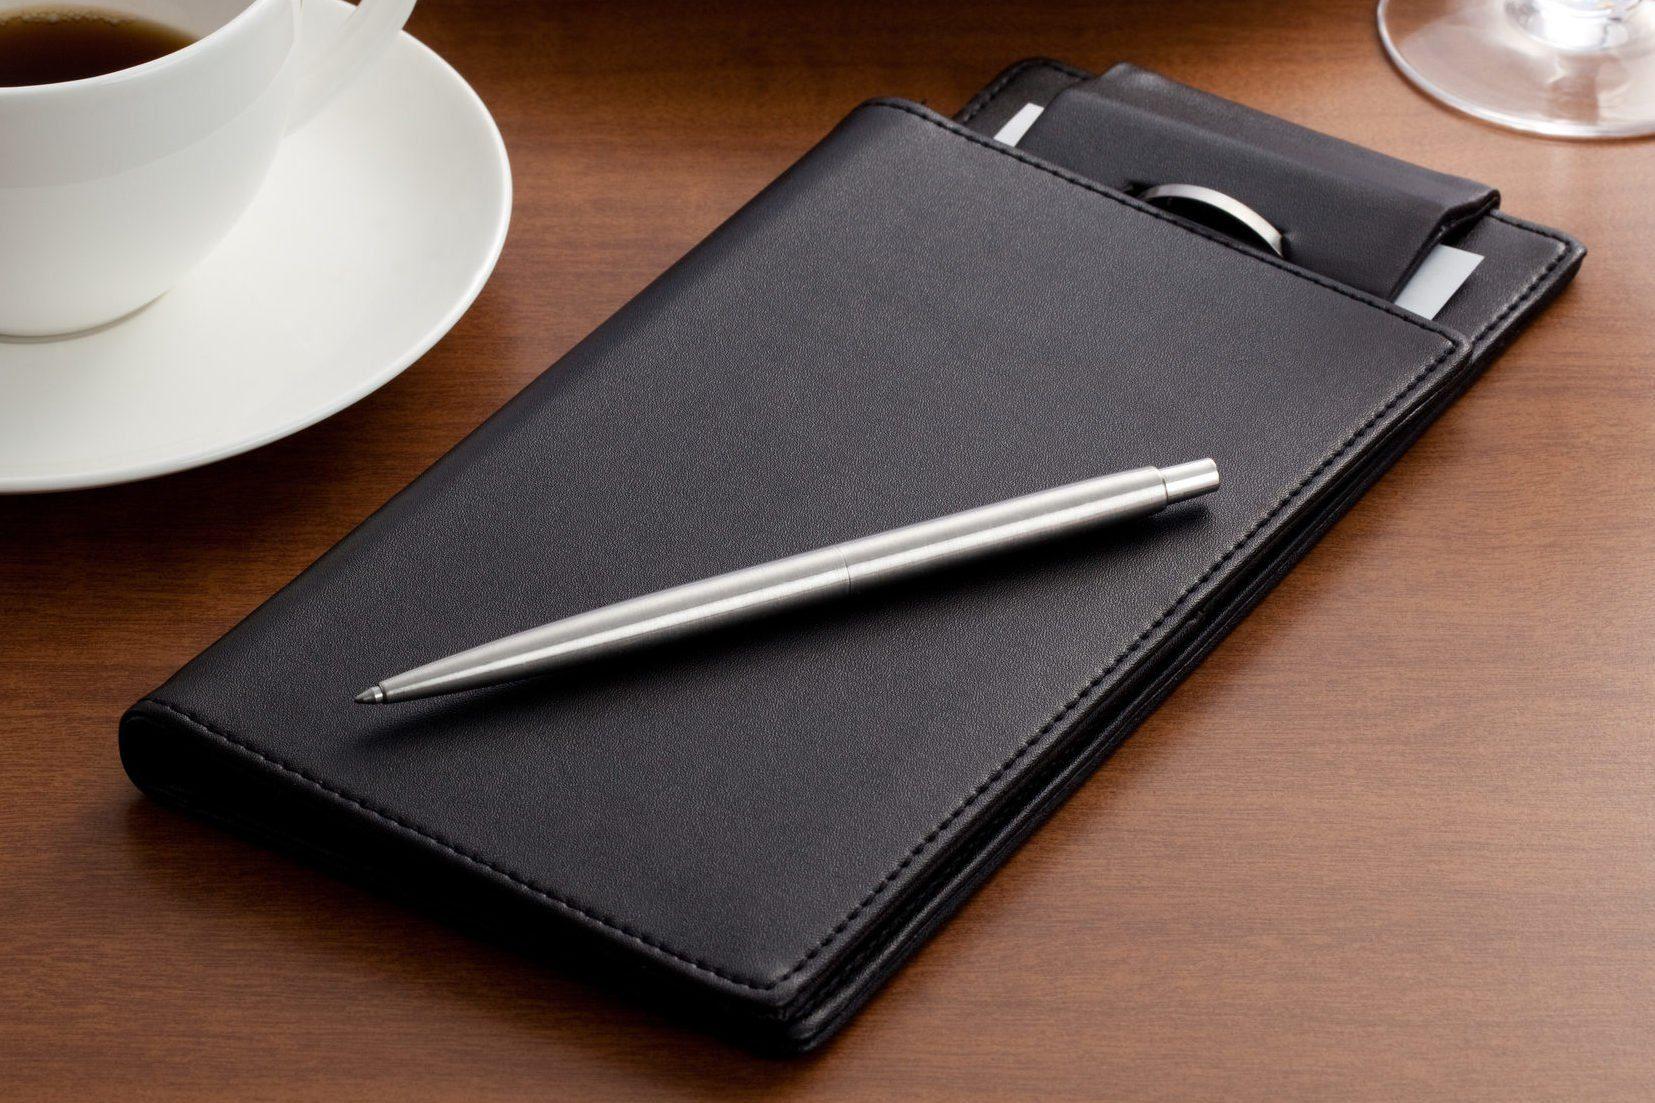 Pen & Guest check book